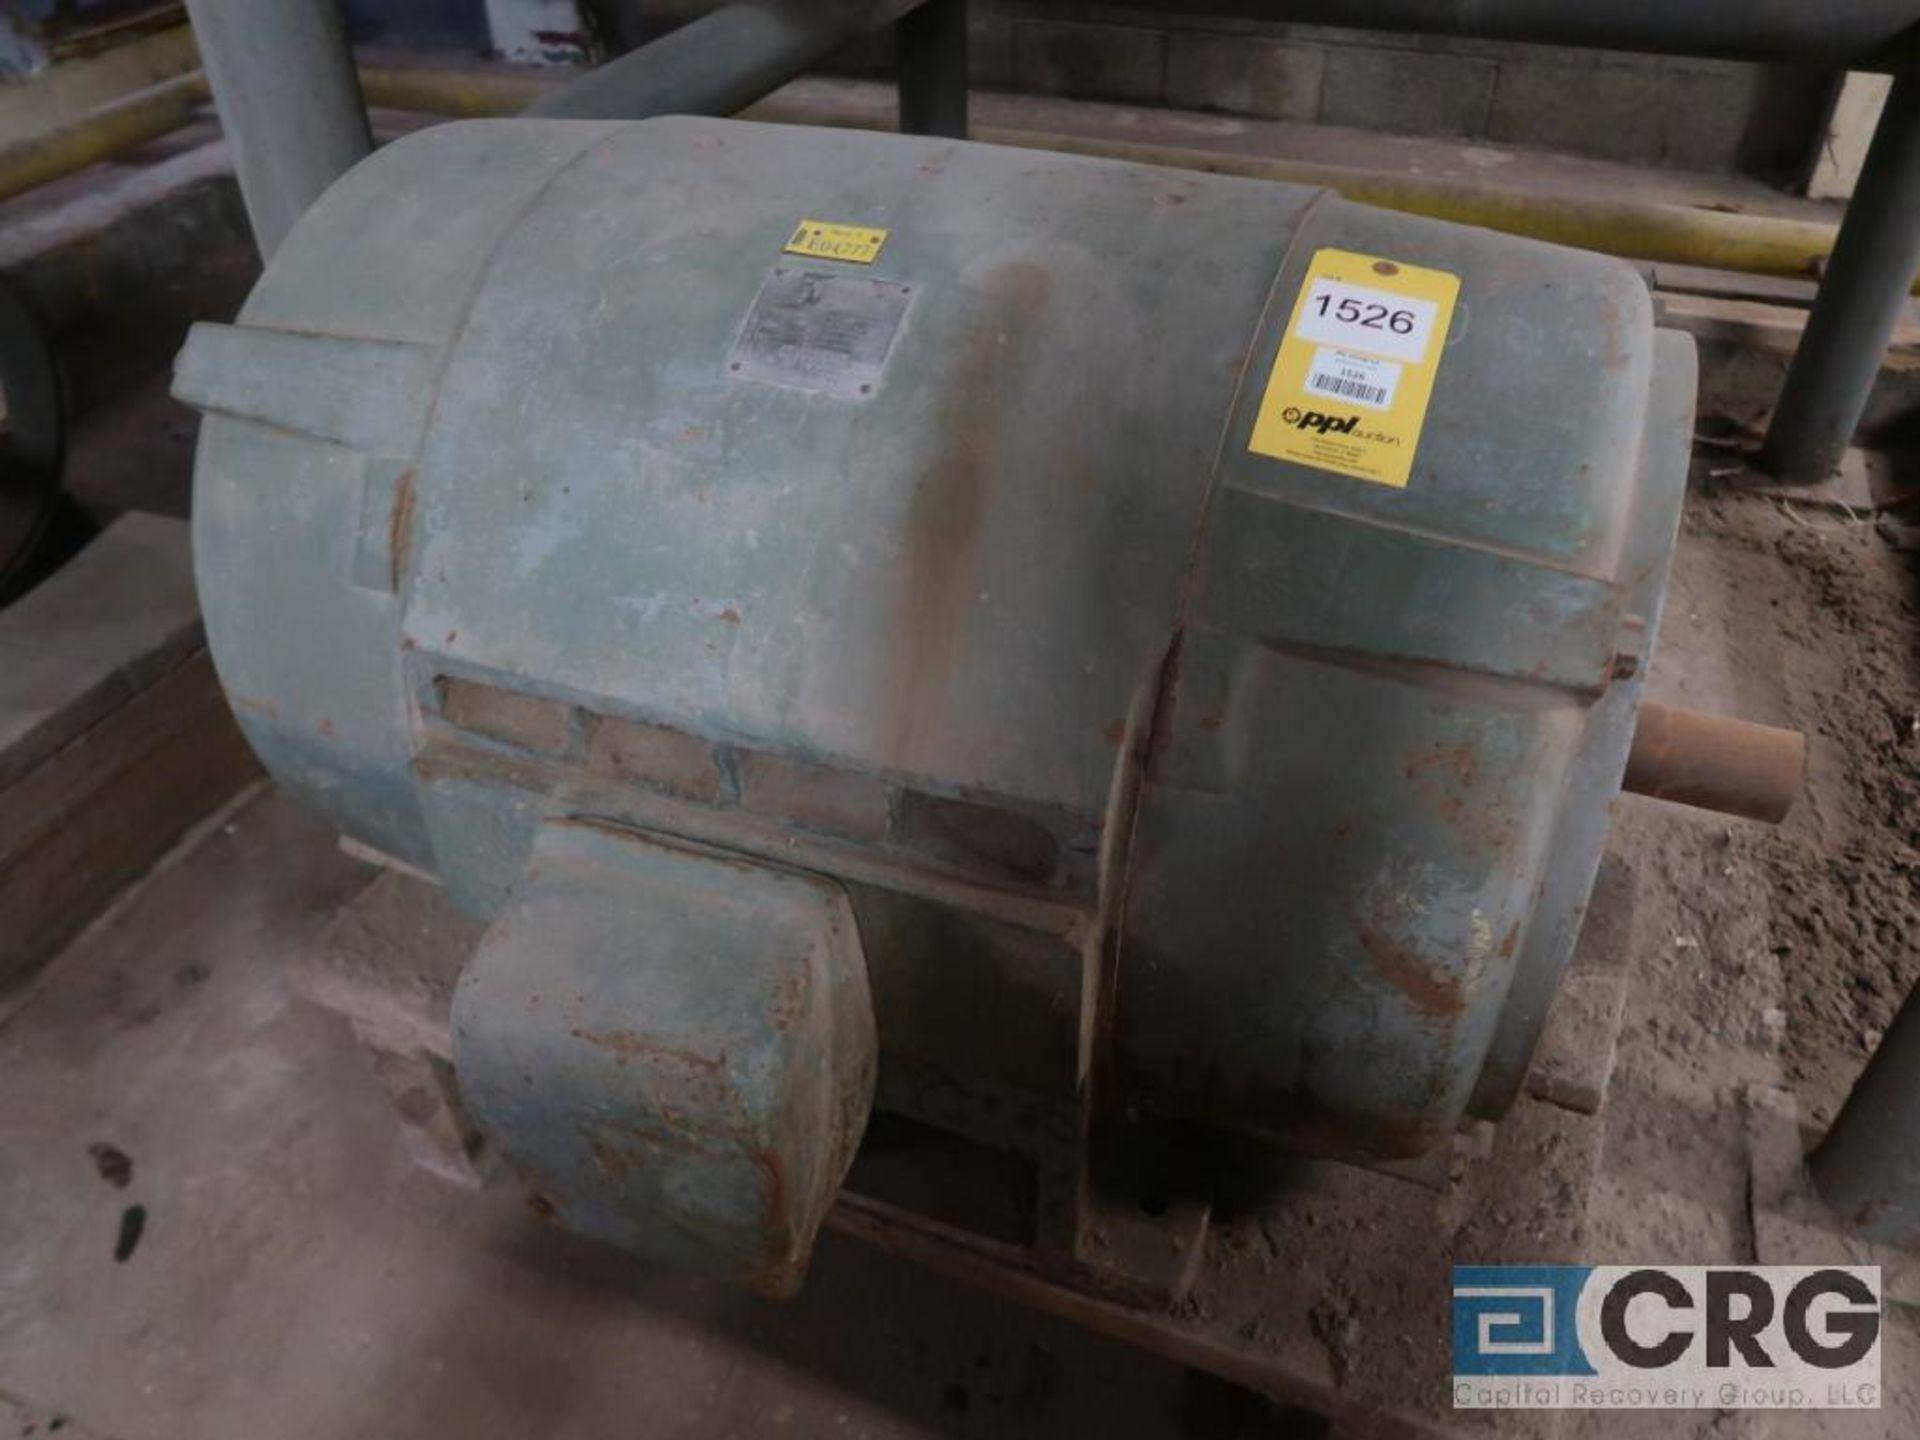 Westinghouse motor, 200 HP, 1,770 RPM, 2,300 volts, frame 506US, equipment #E04777 (496 Dock Area)